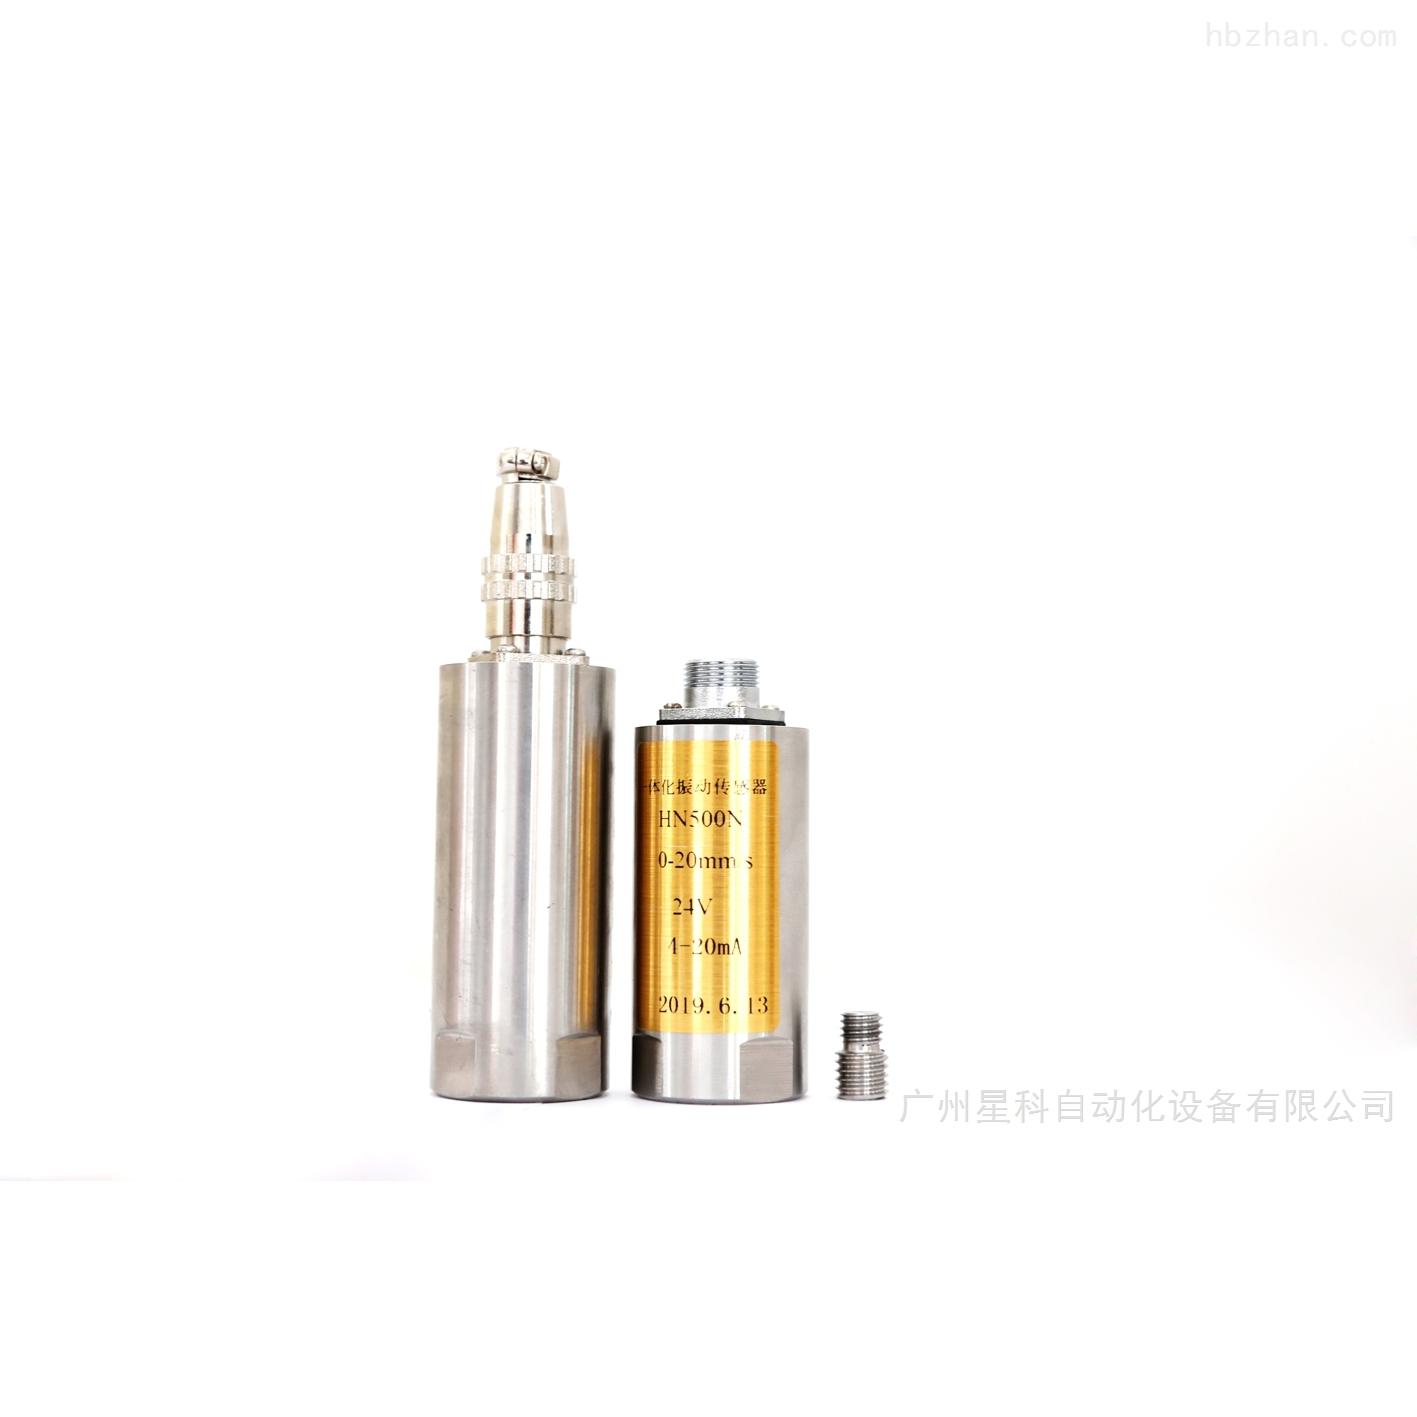 HD-ST-2 振动速度传感器